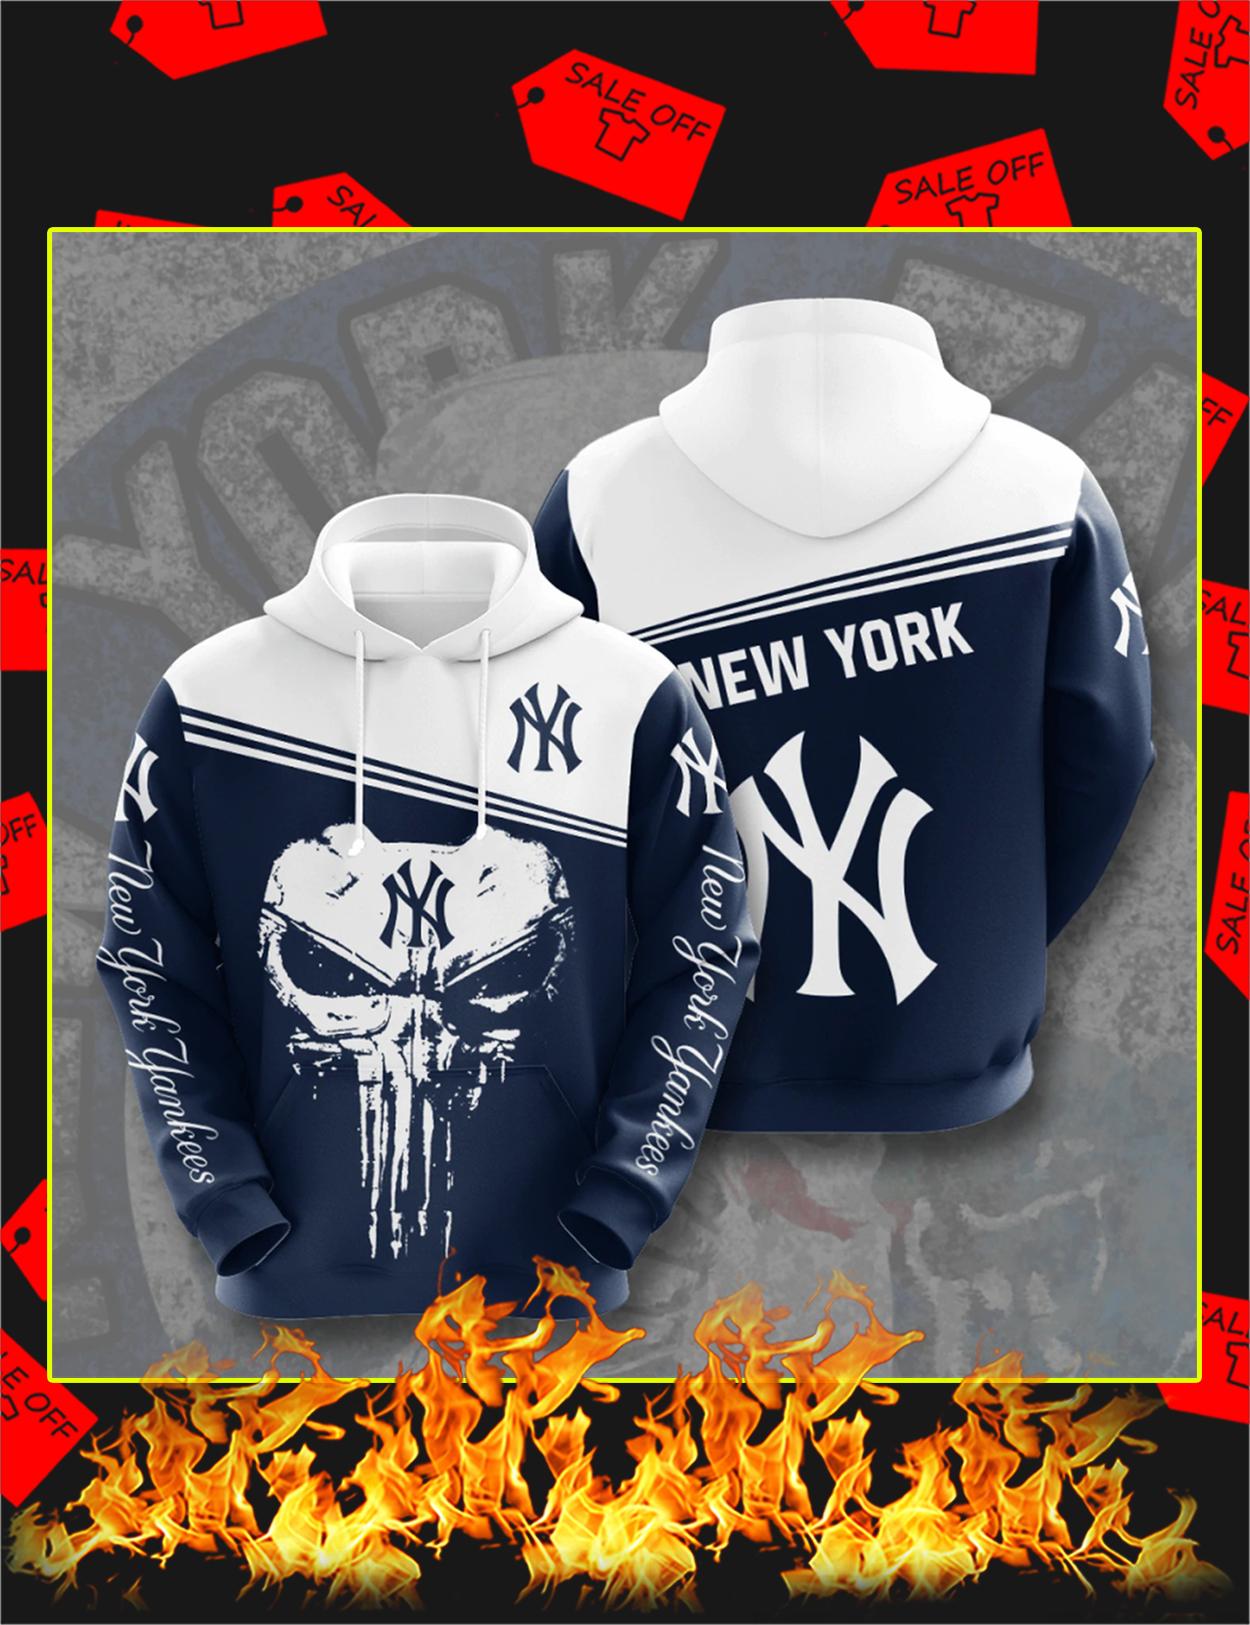 New York Yankees Punisher Skull 3D Hoodie - Size L